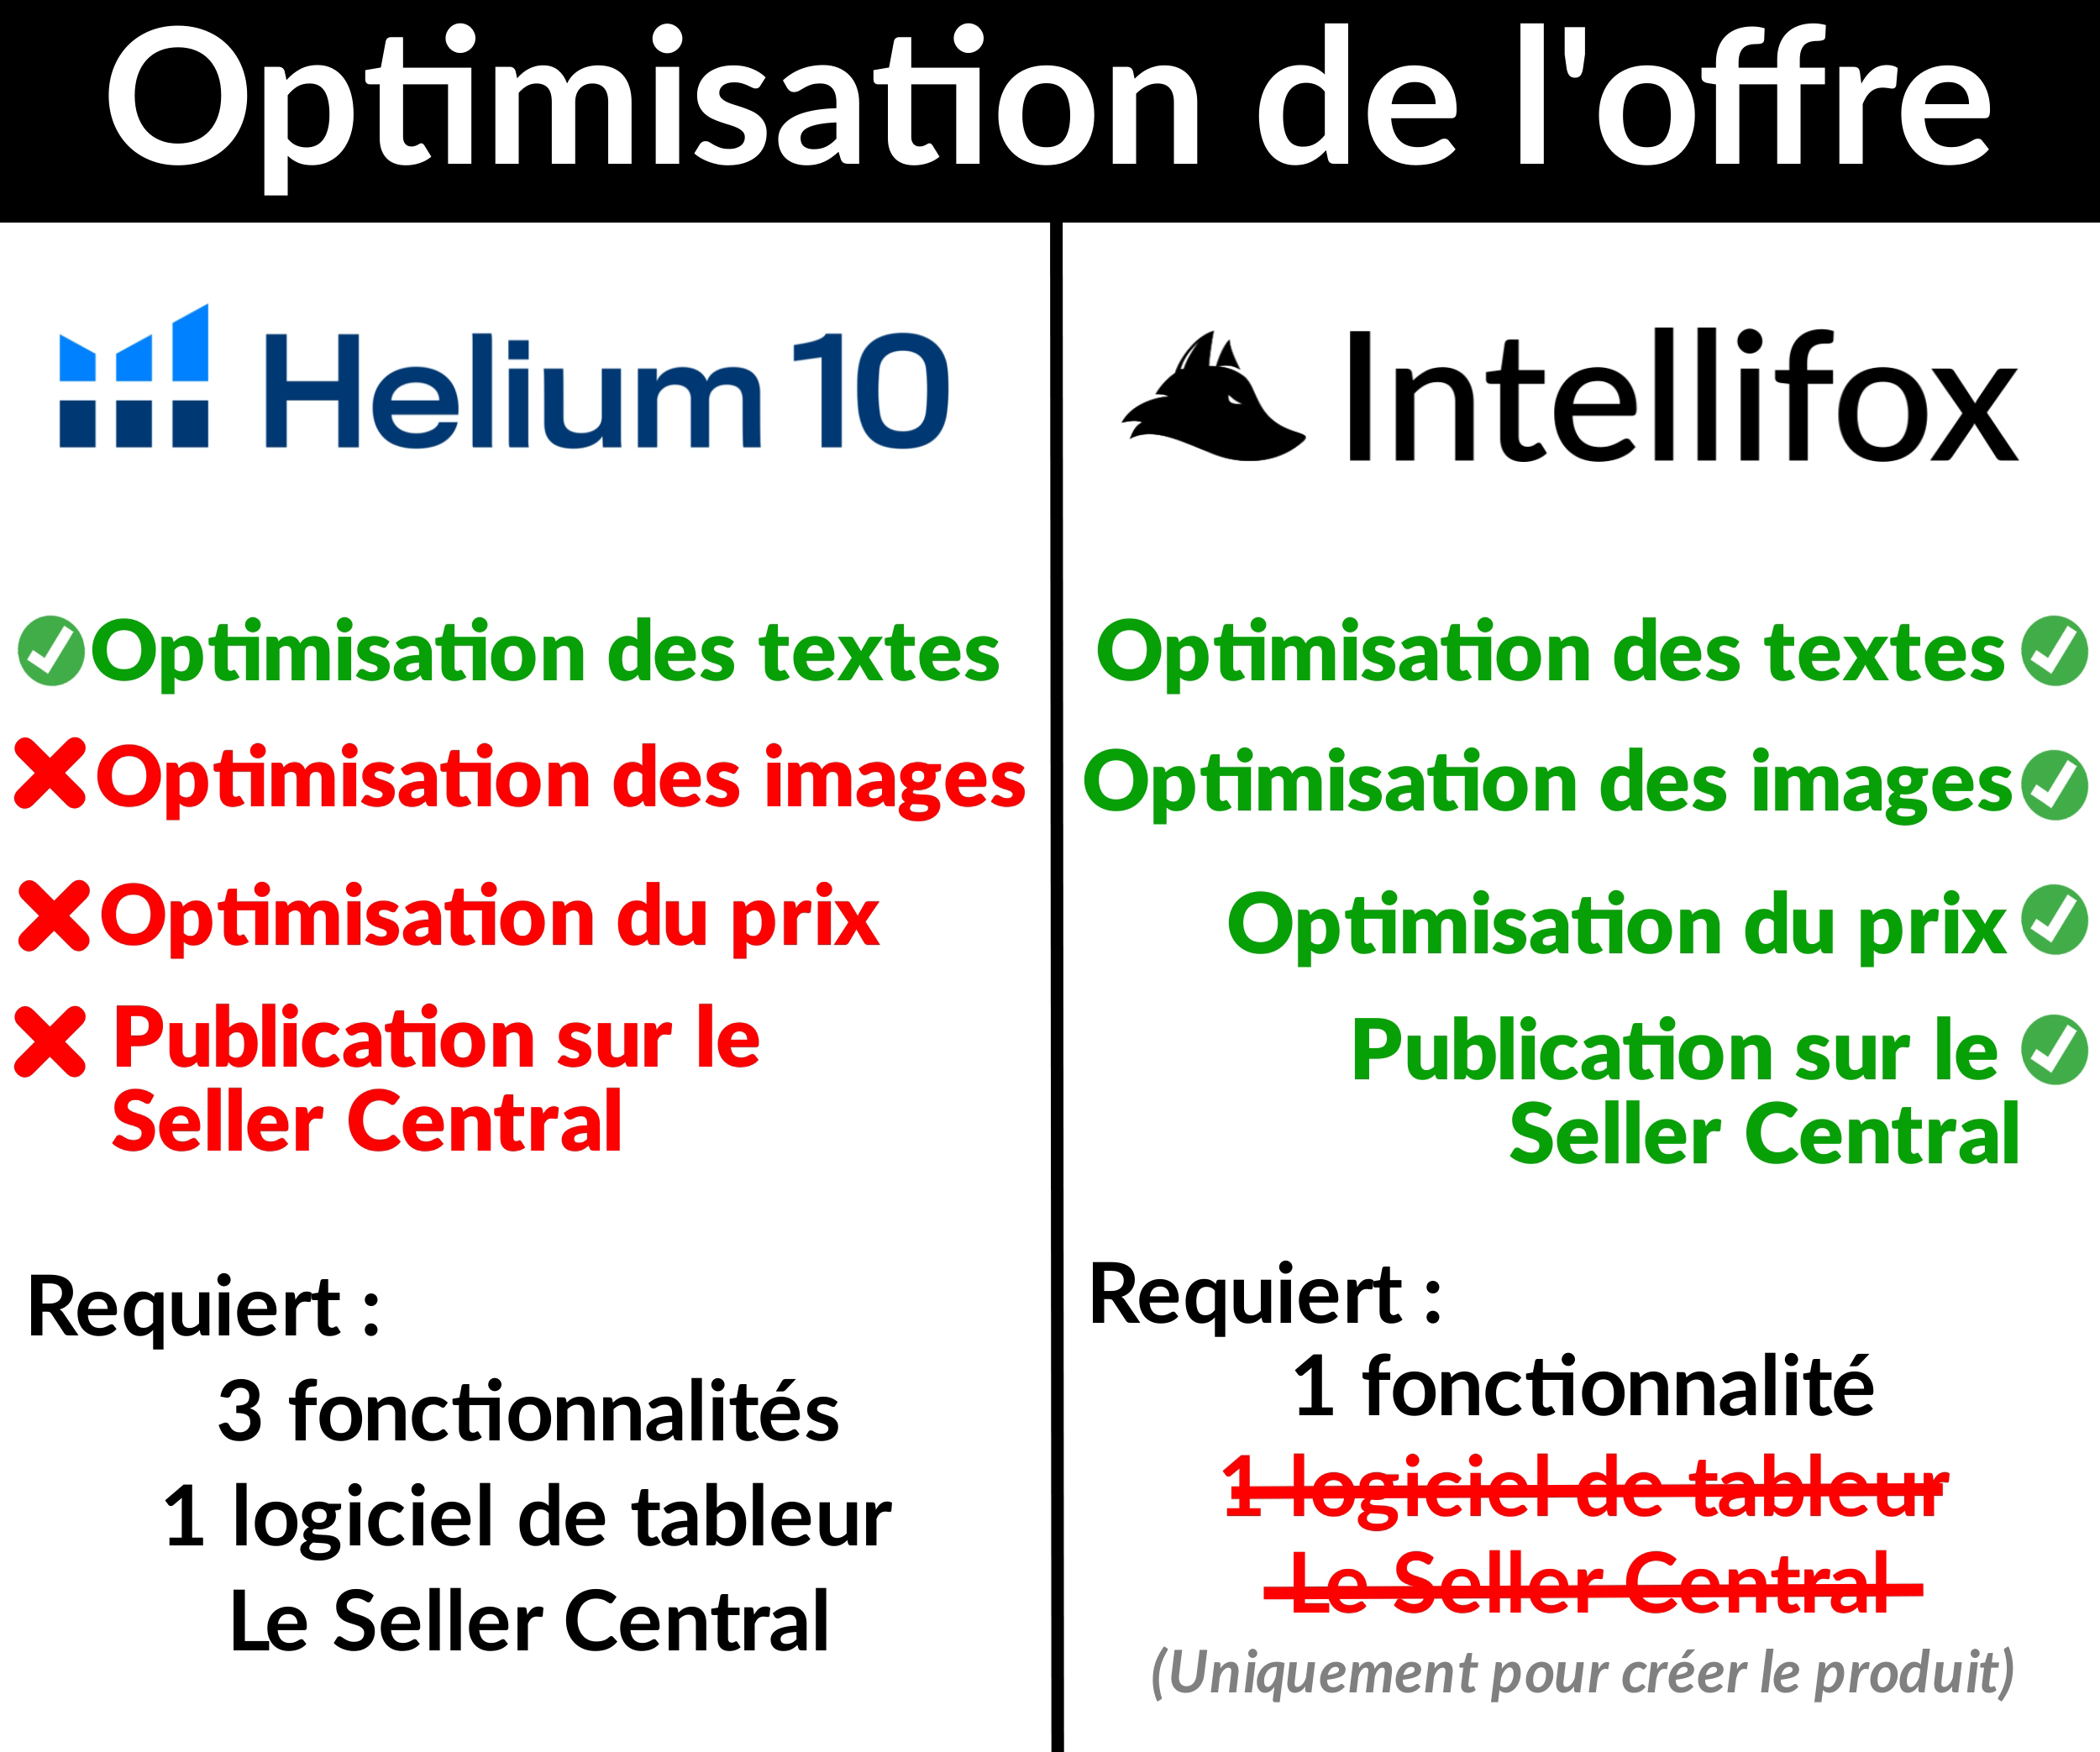 H10-VS-Intellifox-optimisation-de-loffre